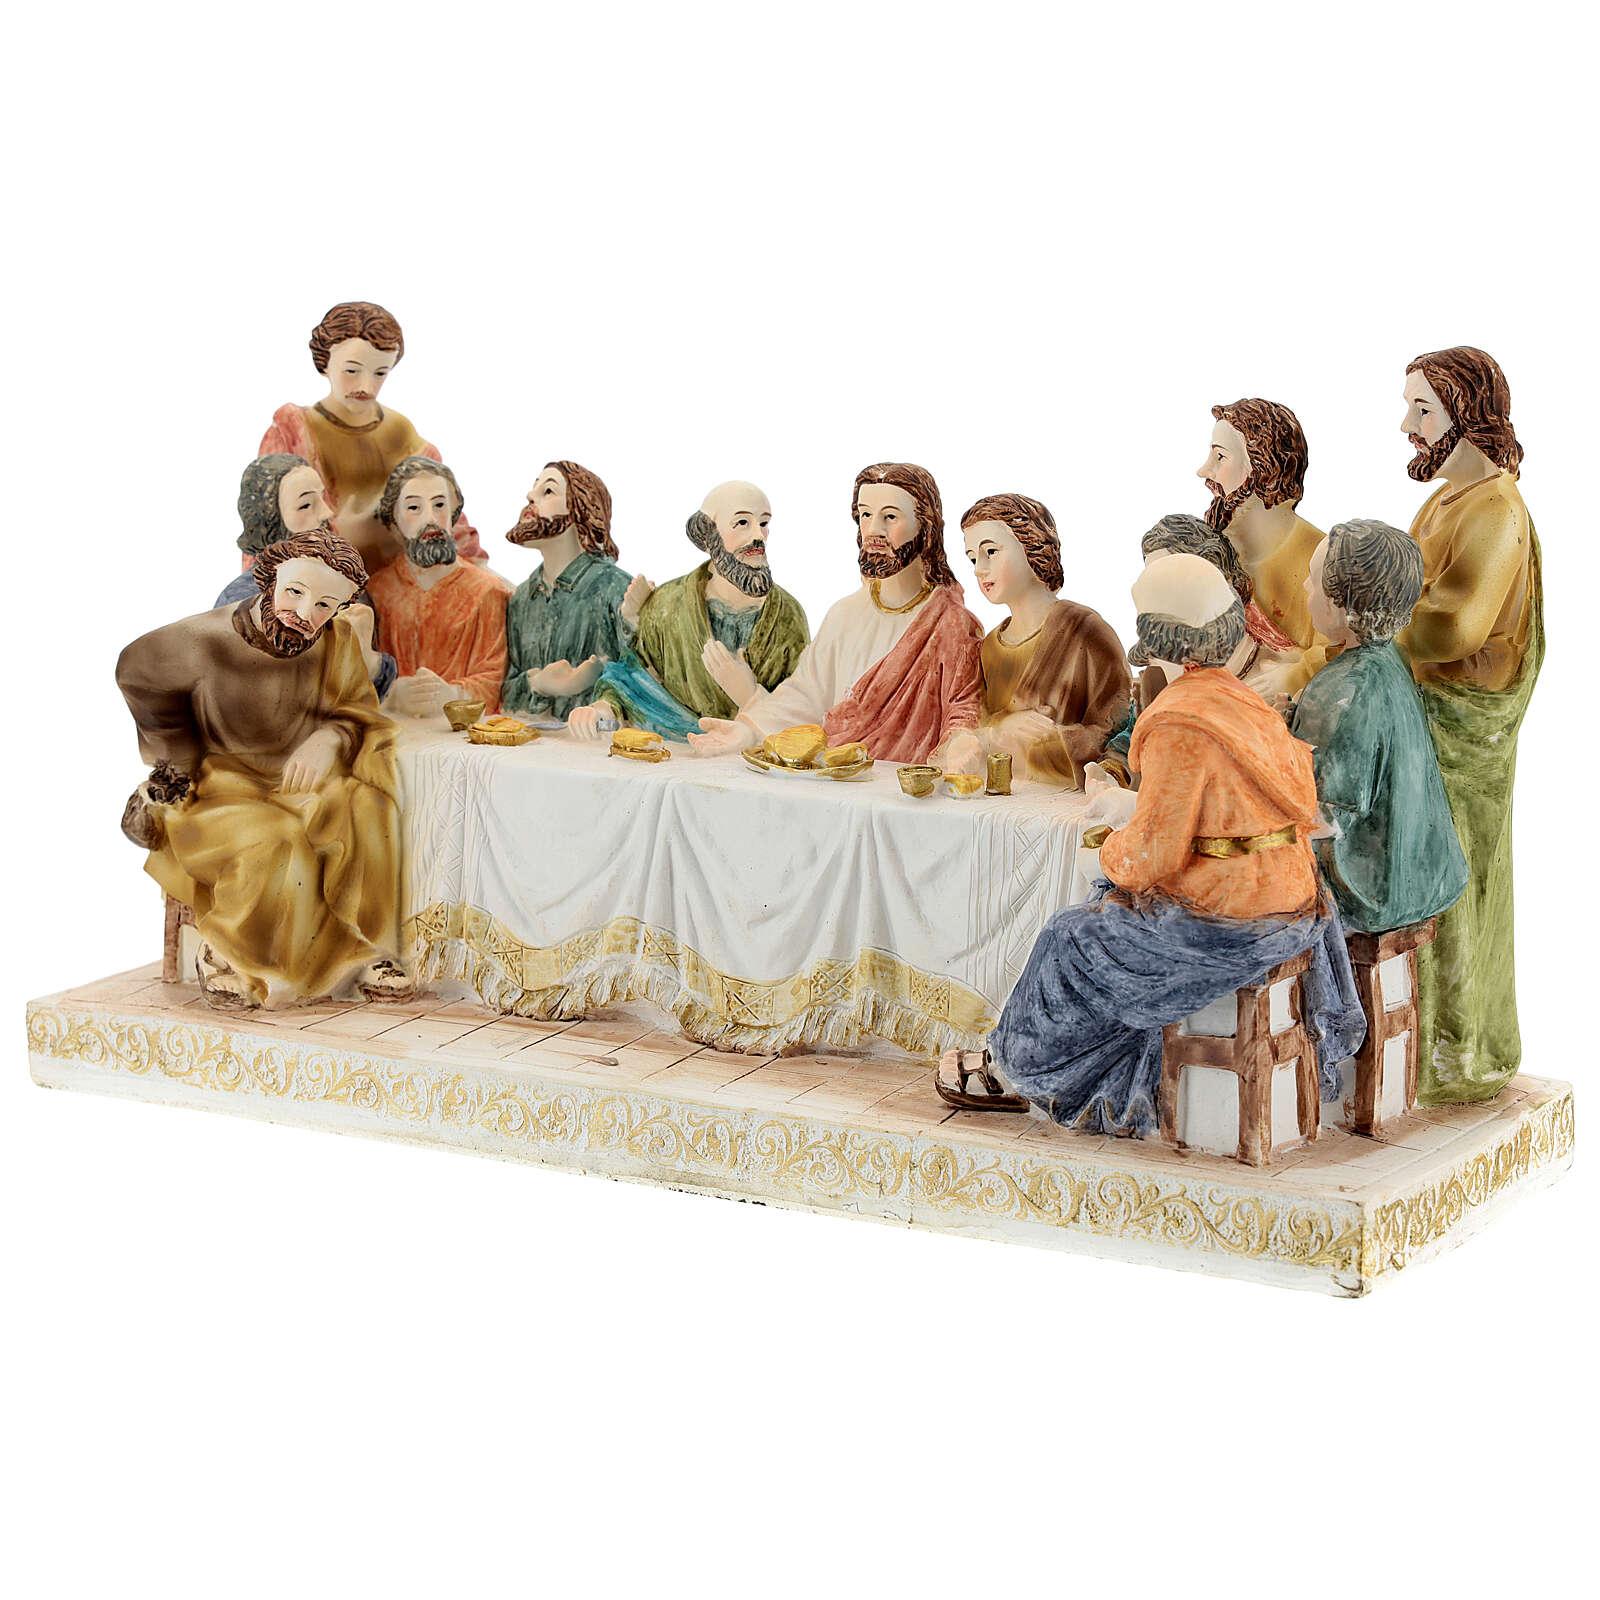 Ultima Cena tovaglia dorata resina 15x30x10 cm 4